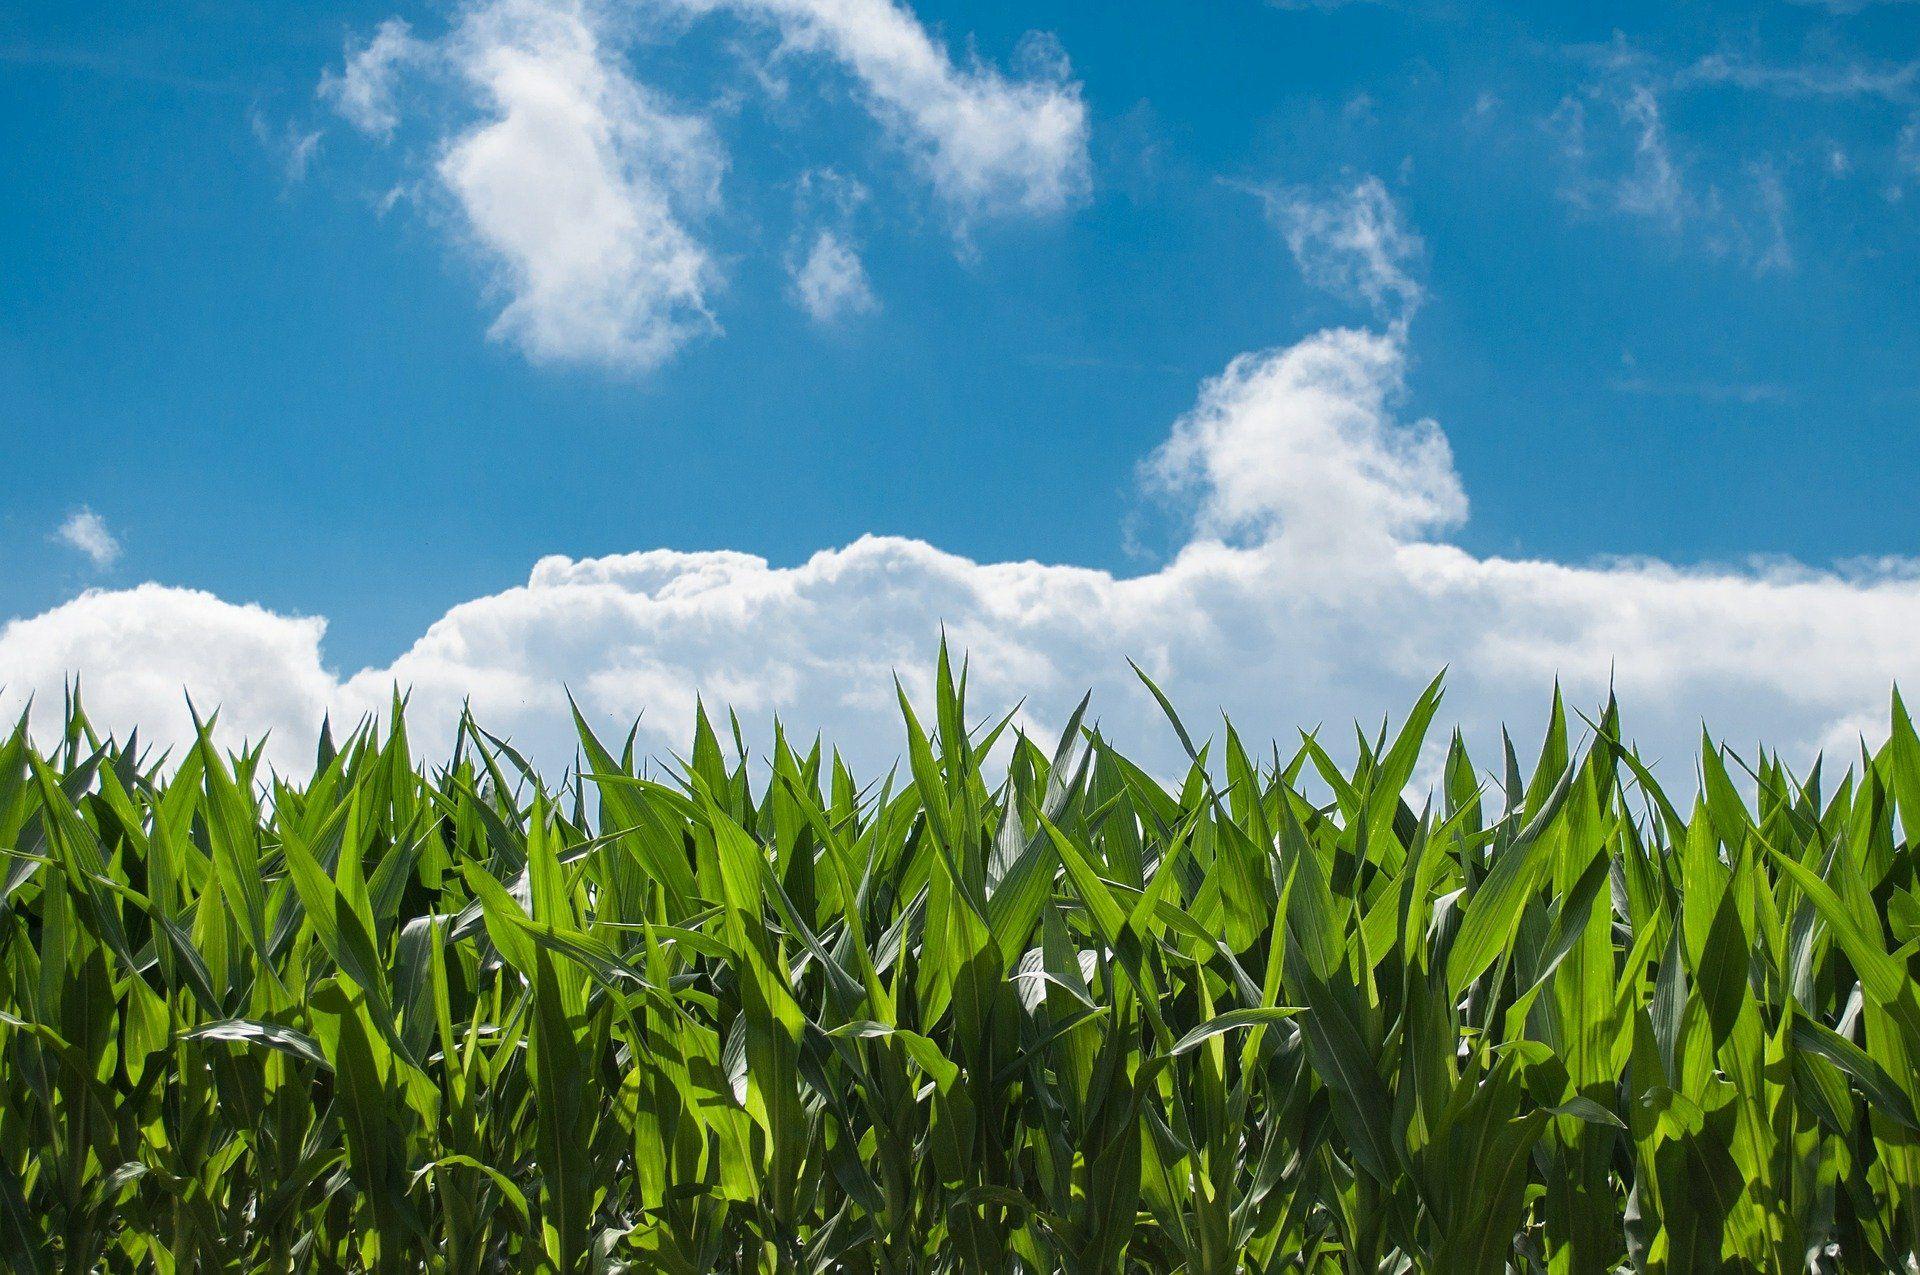 EU-genehmigt zehn gentechnisch veränderte Organismen